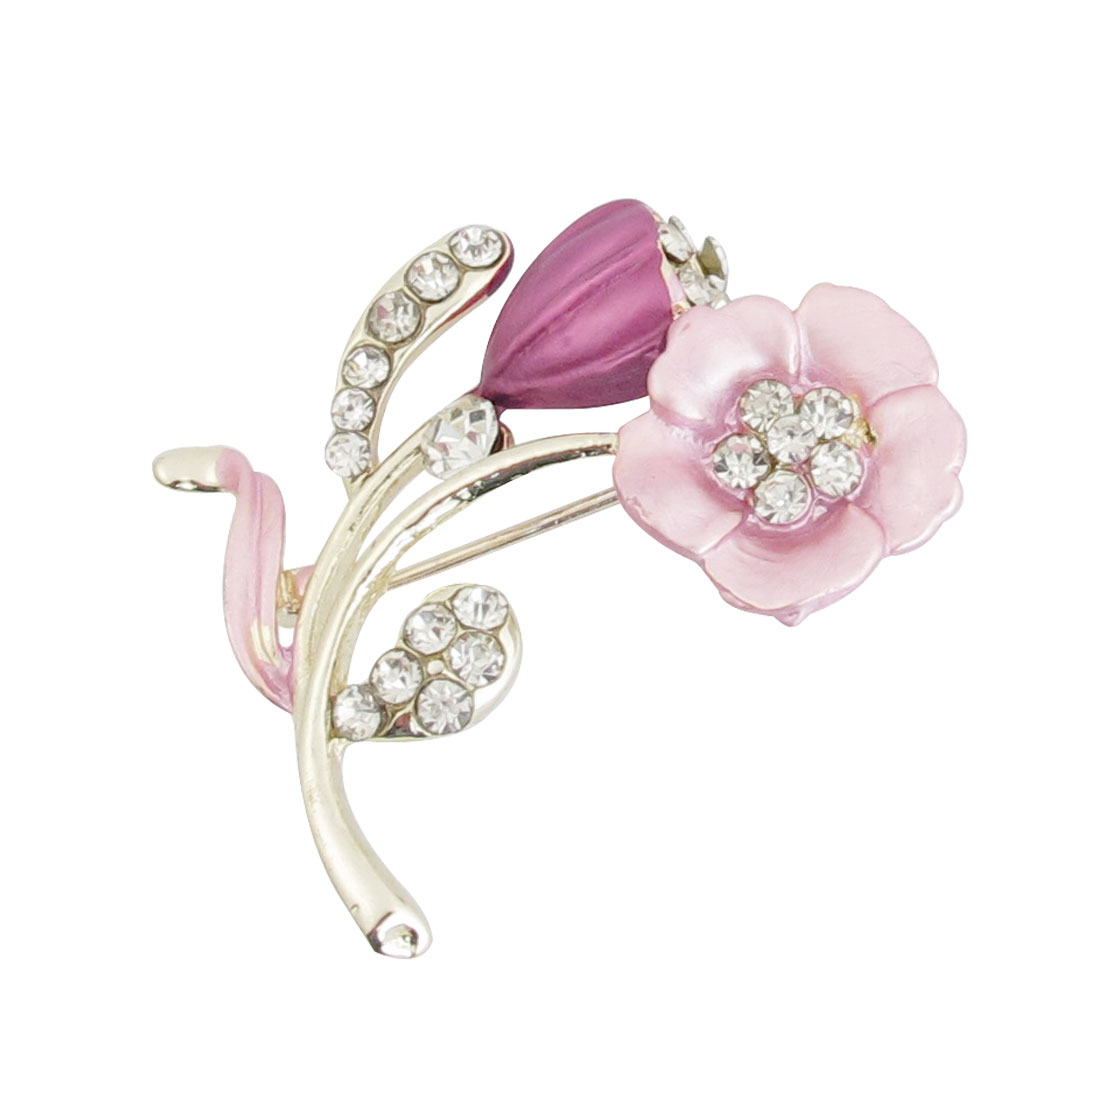 Rhinestone Detail Pink Flower Branch Brooch Pin Bridal Decoration